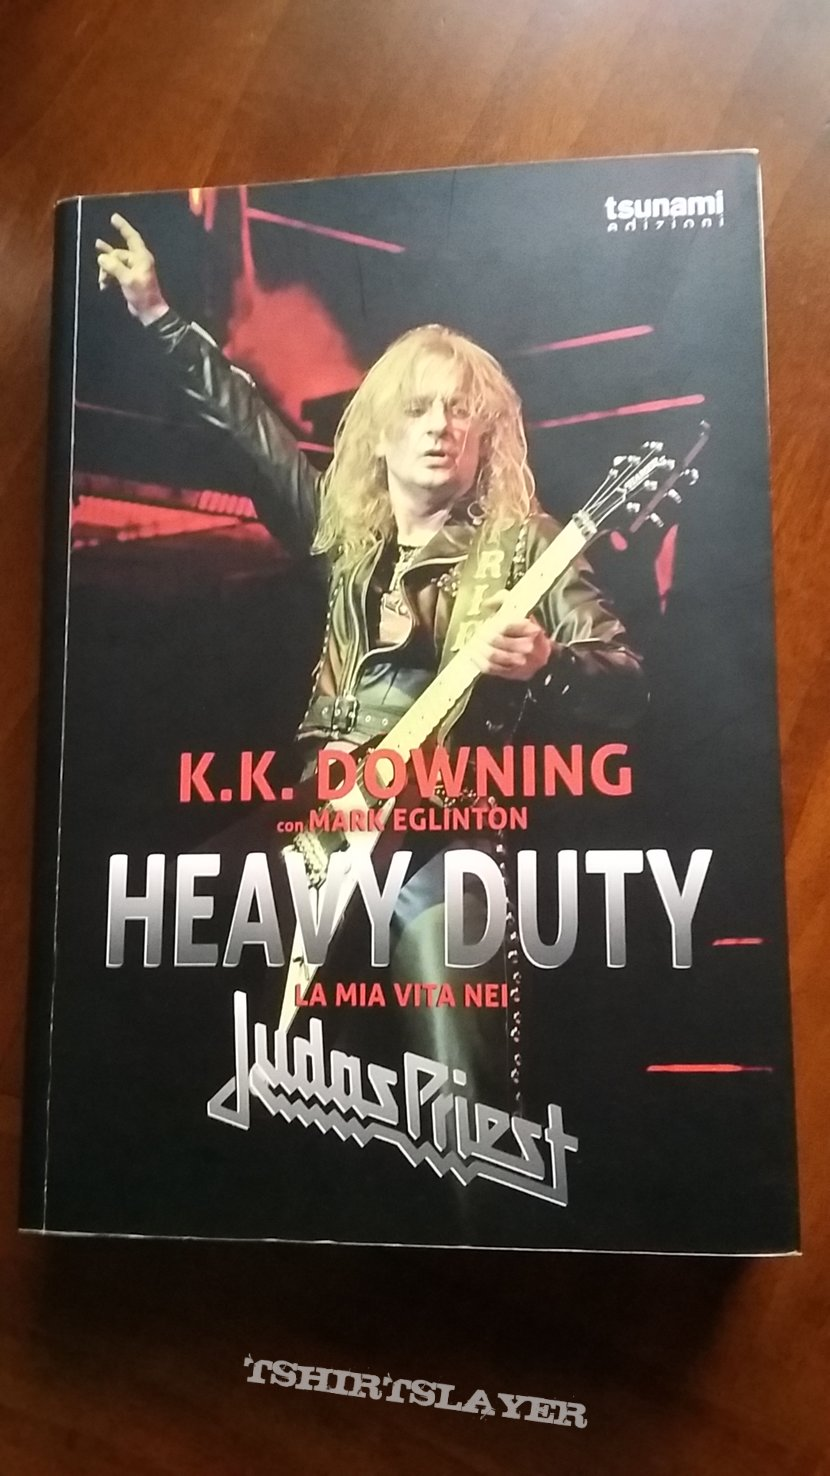 K.K. Downing - Heavy Duty / Days & Nights in Judas Priest